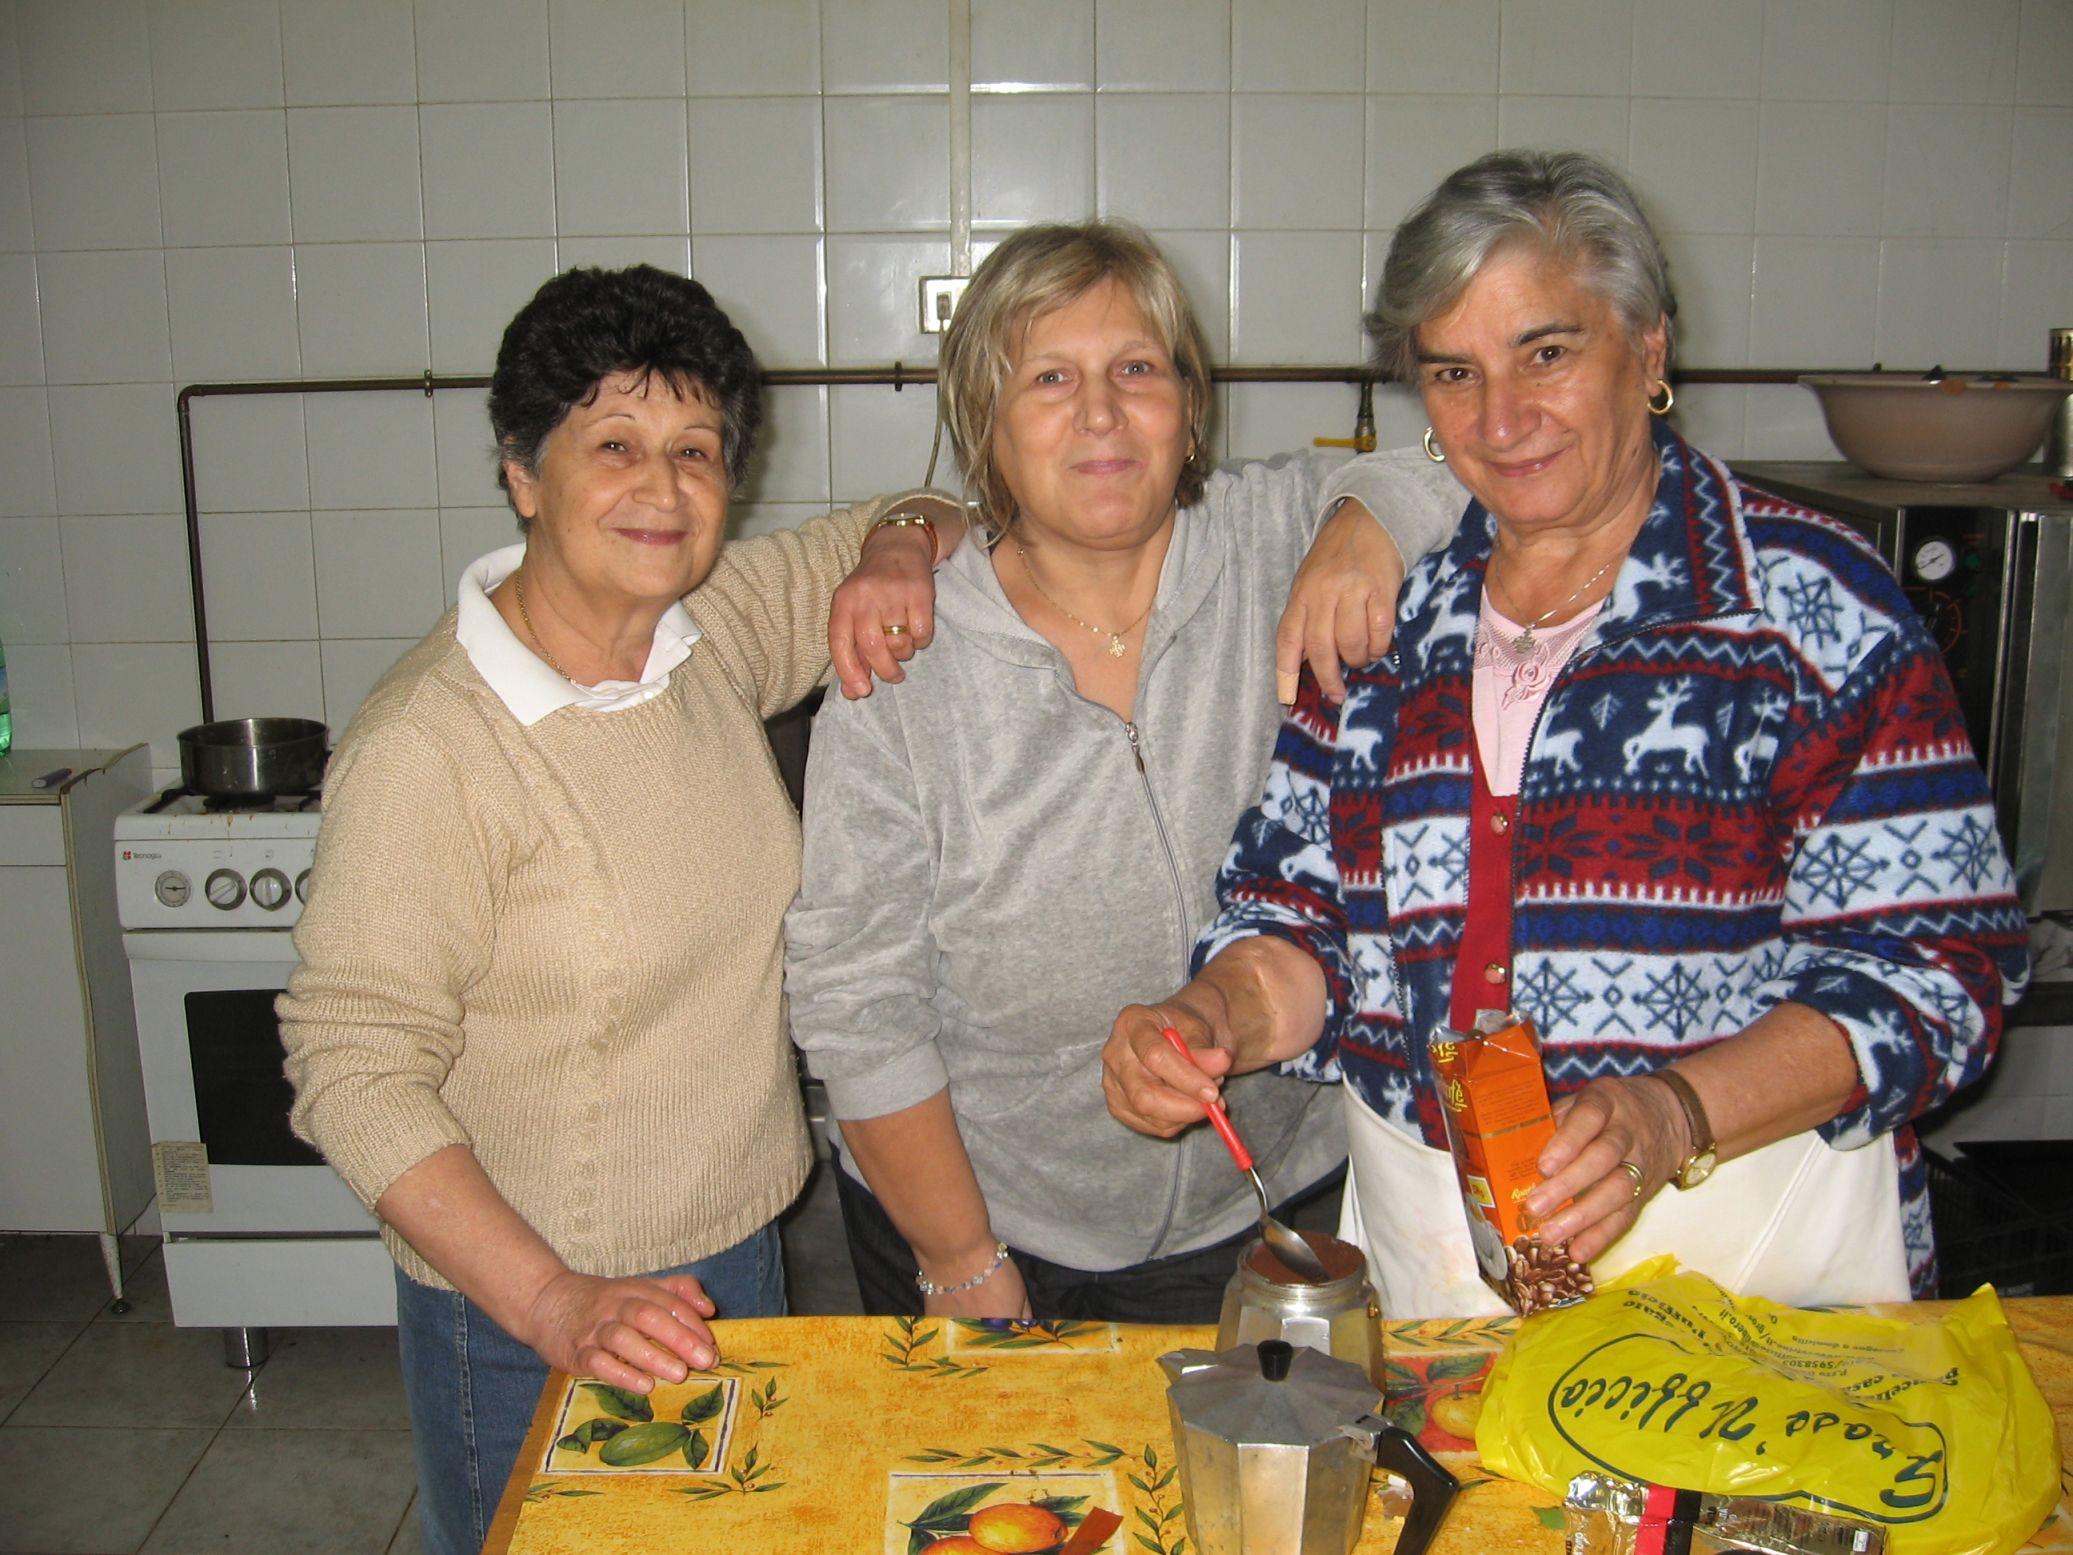 Bivacco_Persone_Impegnate_Torriglia-2009-09-20--14.17.26